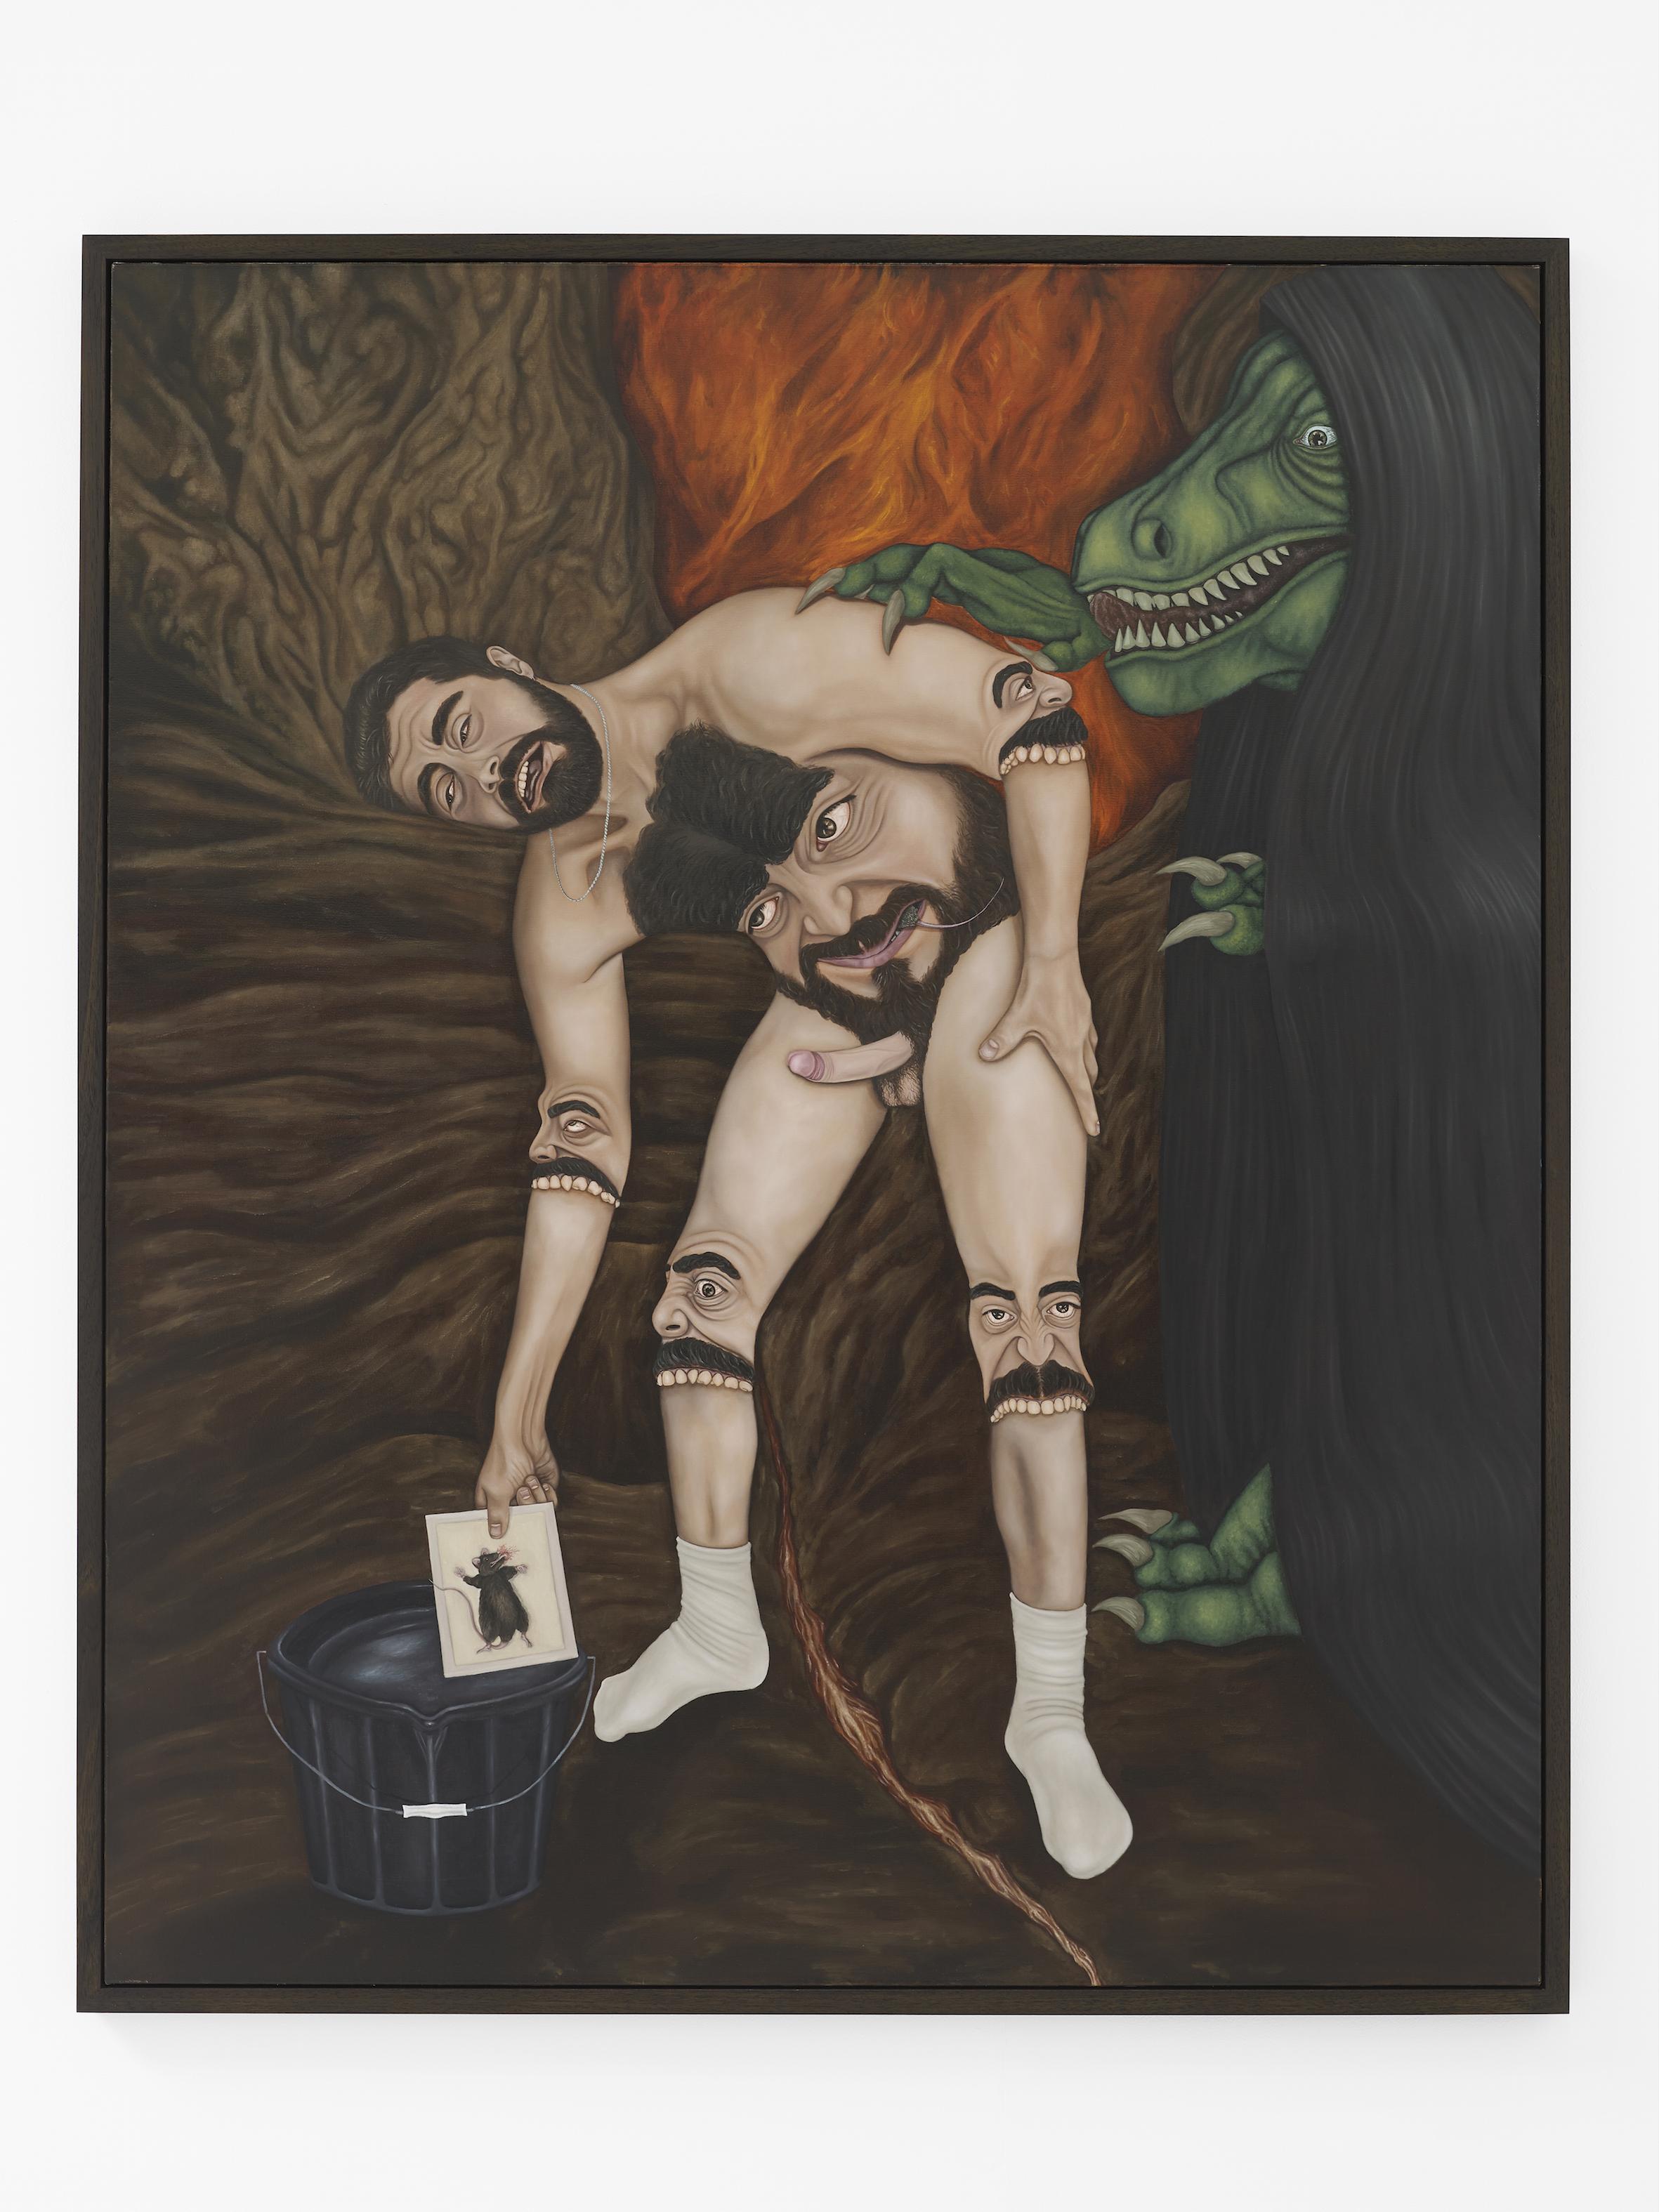 Glen Pudvine, Dying, 2019